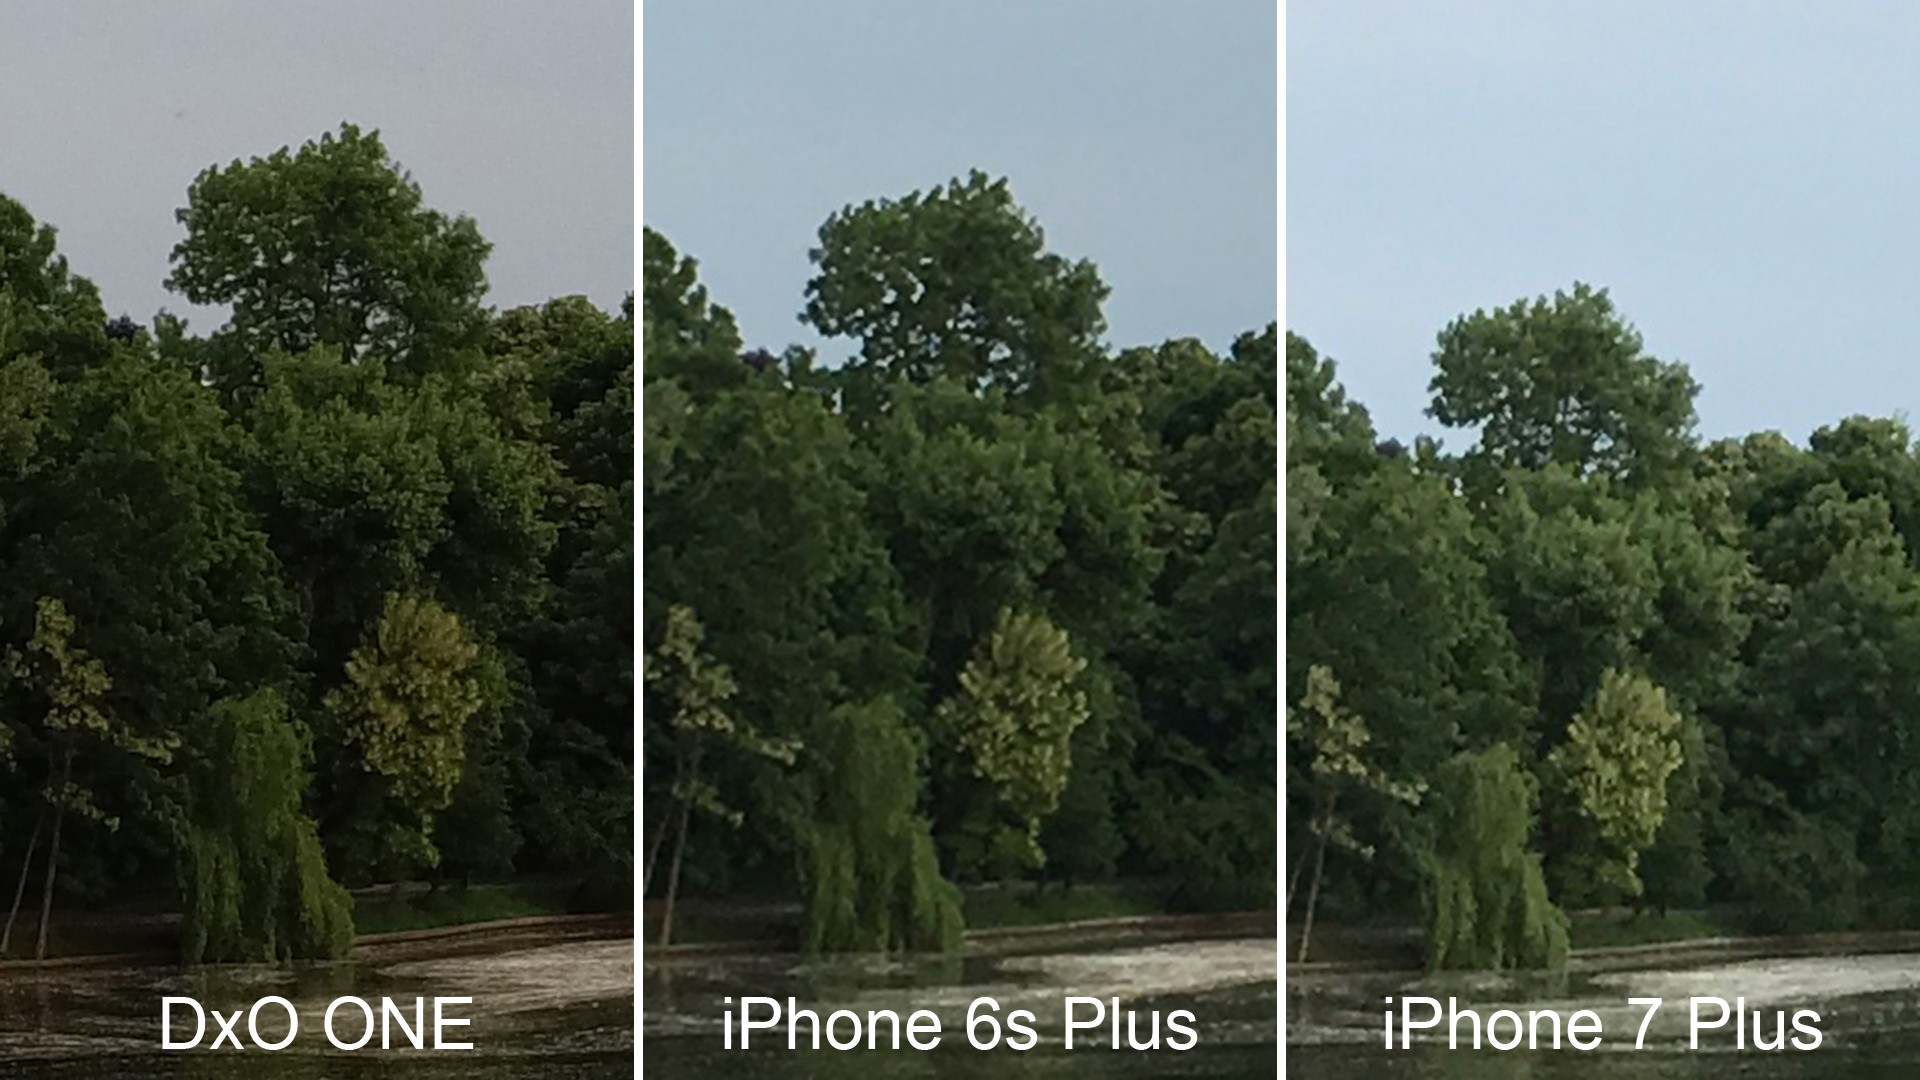 iphone 6s vs iphone 7 vs iphone 8